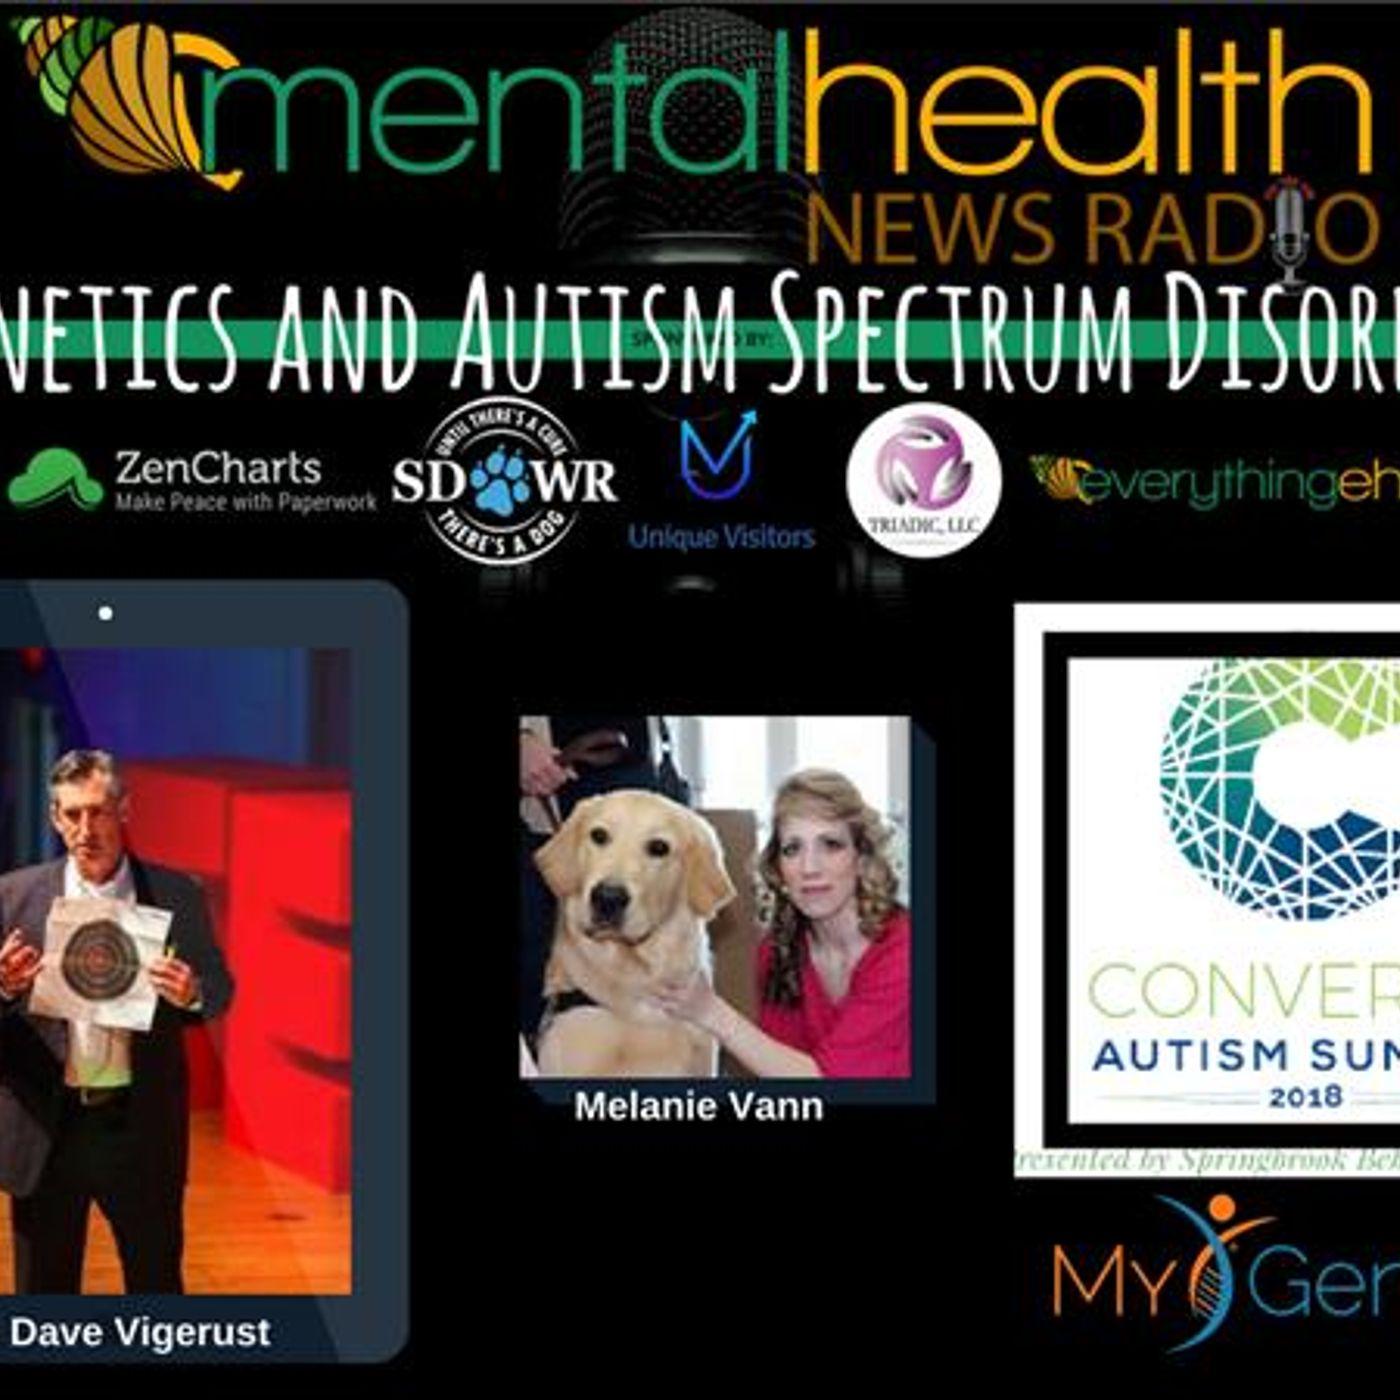 Mental Health News Radio - Genetics and Autism Spectrum Disorder: Dr. Dave Vigerust with MyGenetx